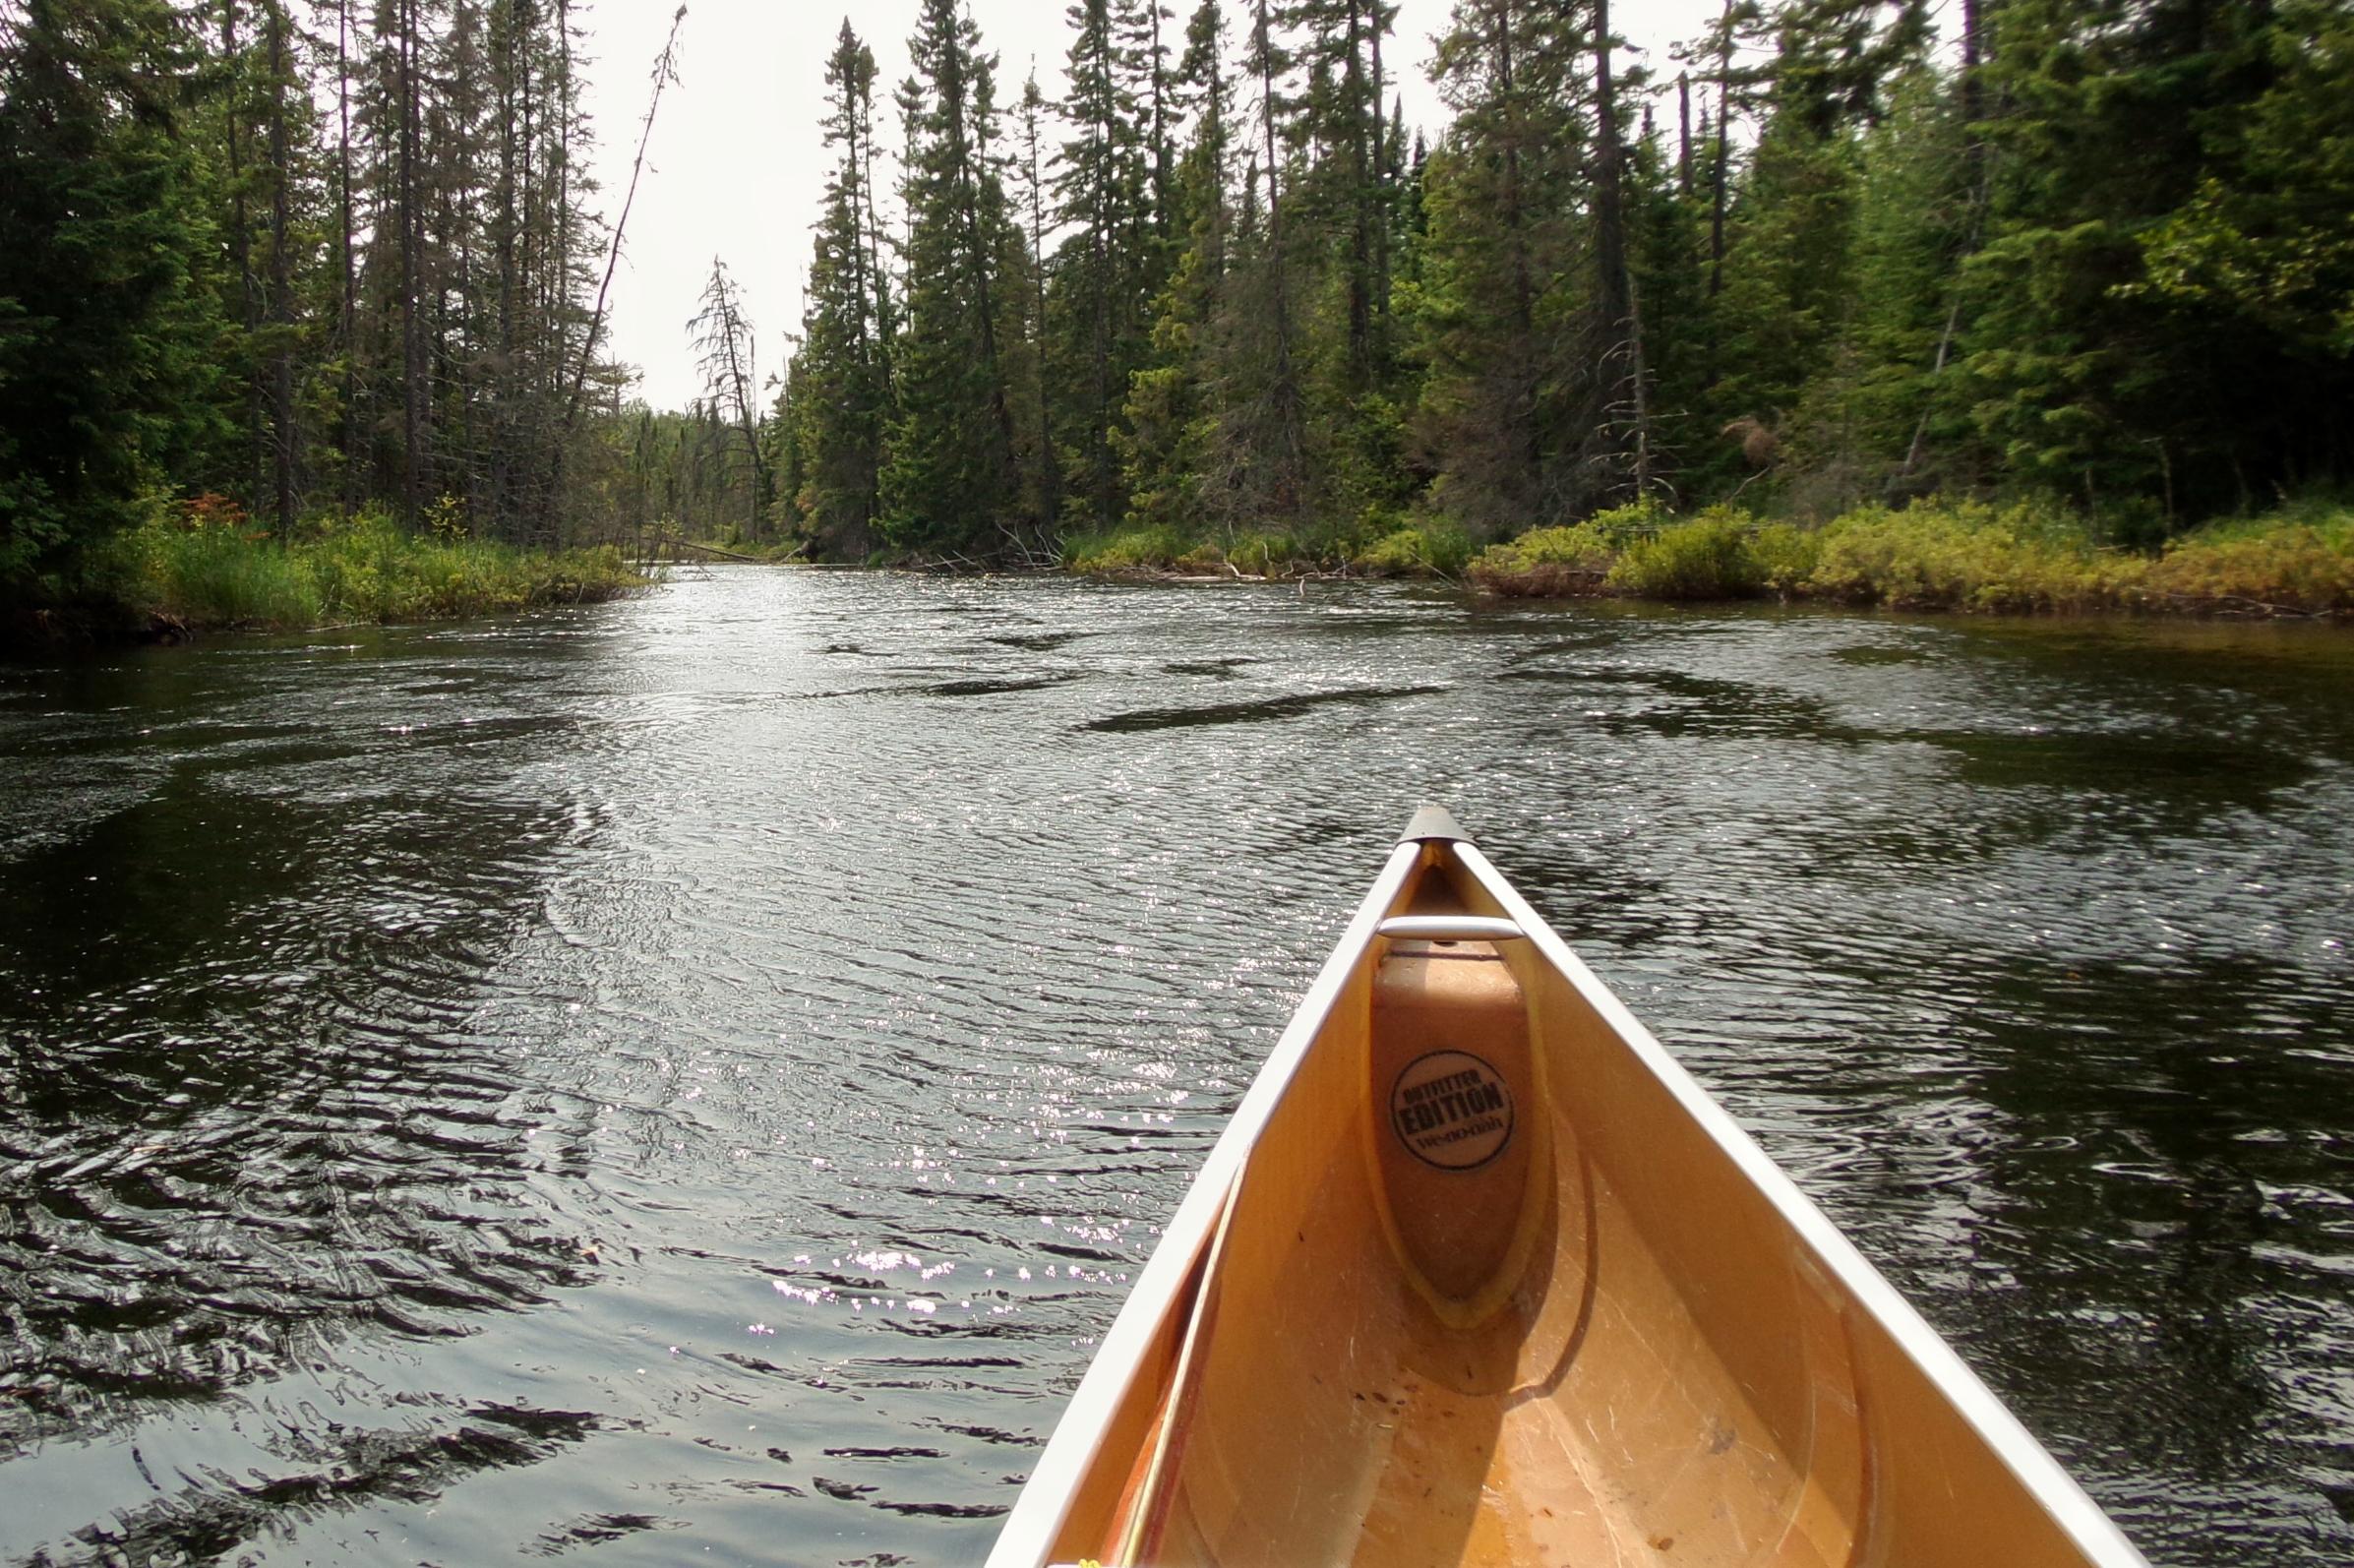 The Temperance River